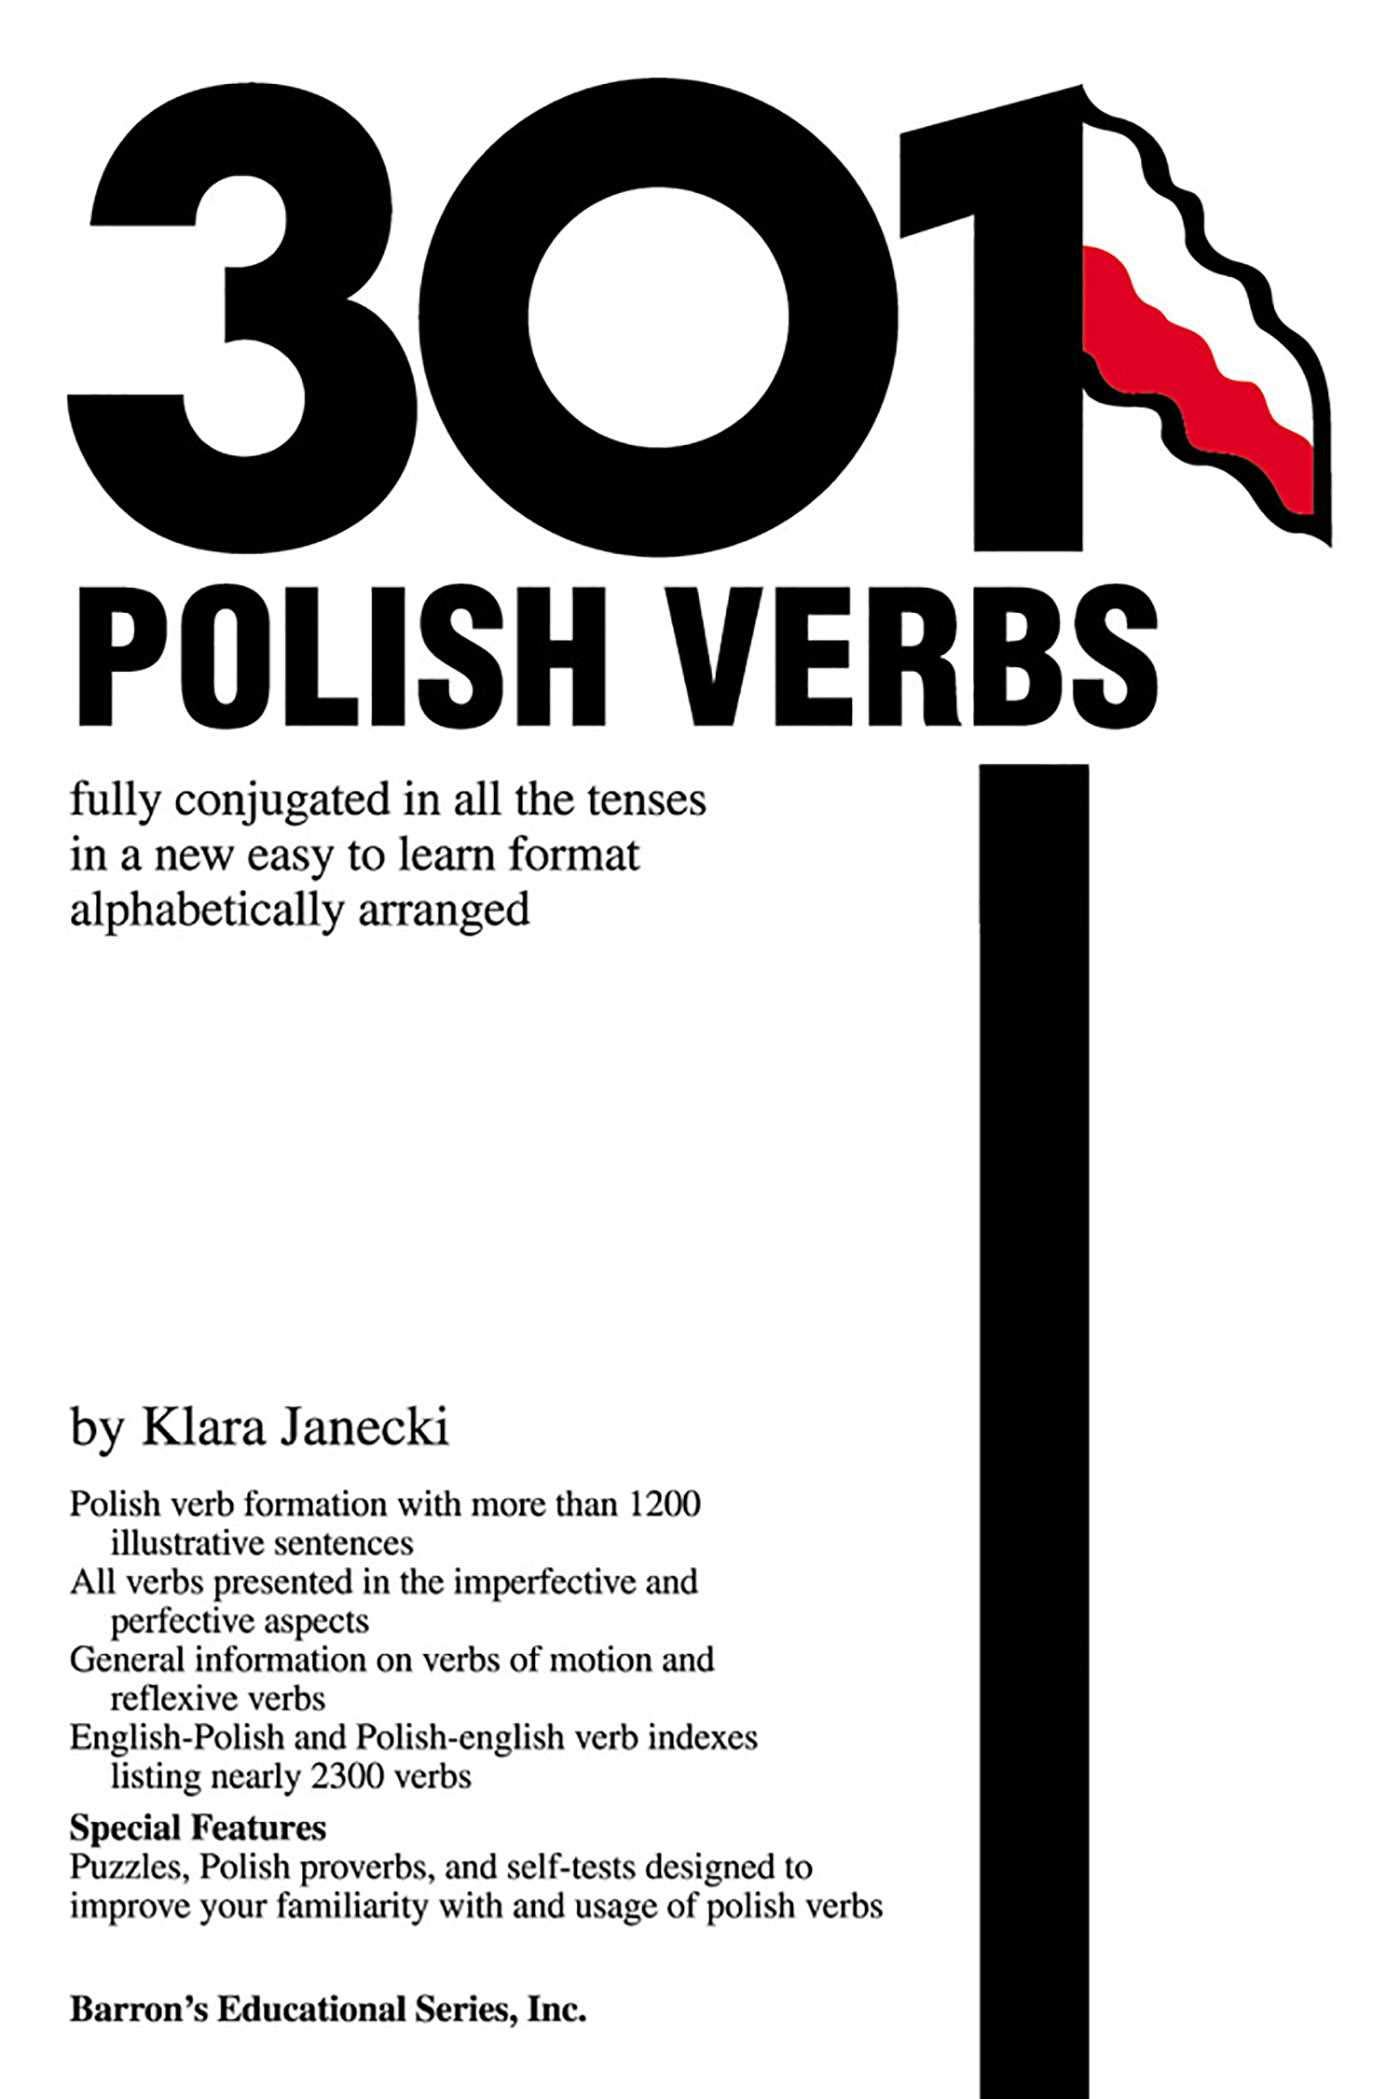 amazon 301 polish verbs 201 301 verbs series klara janecki